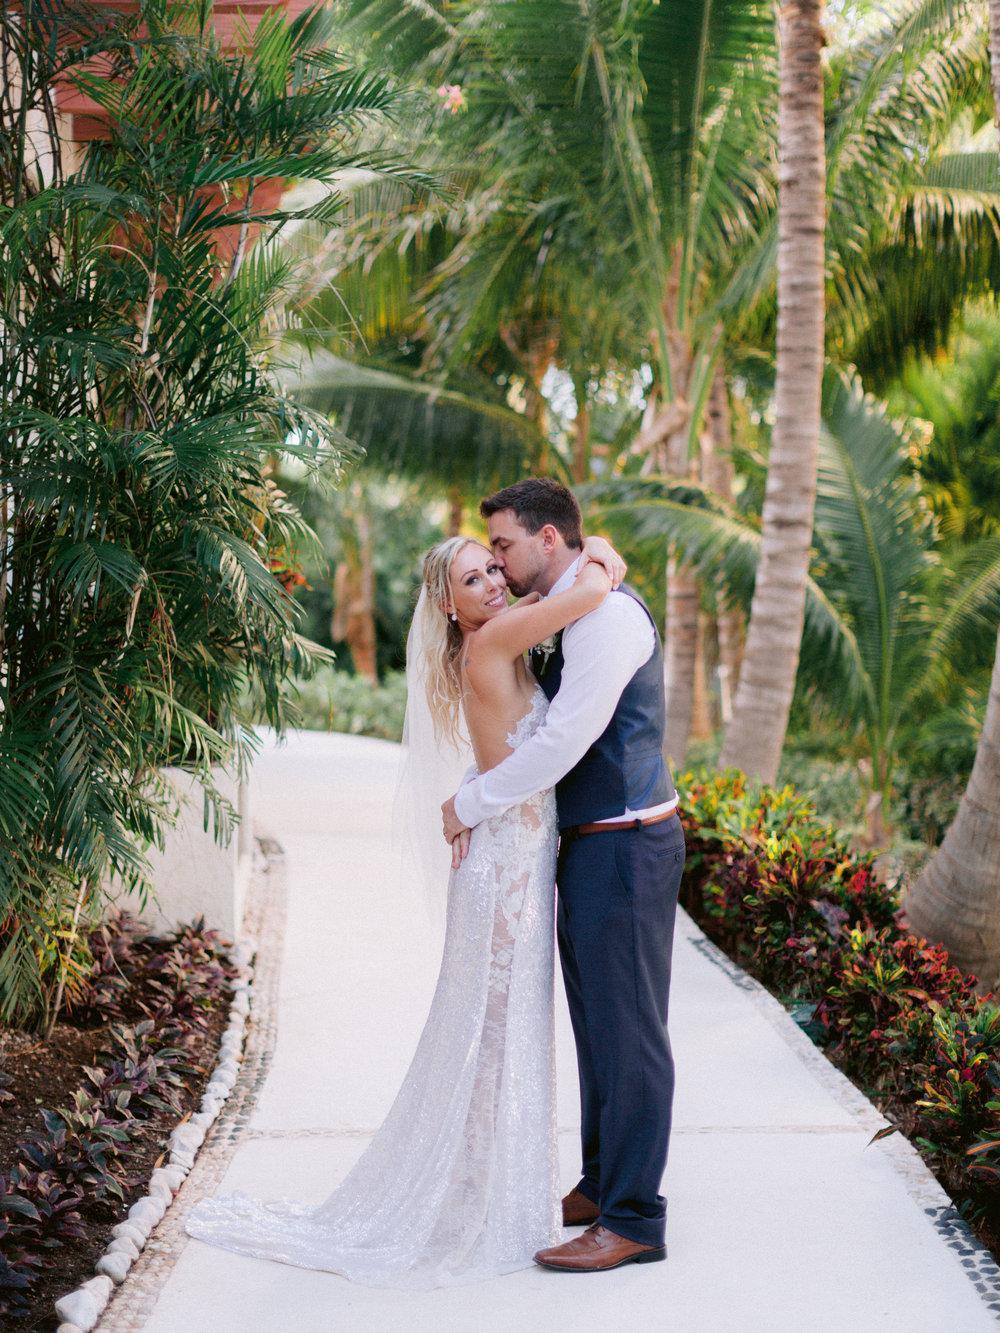 Kim_Jeff_Cancun Wedding_Portraits_Kurtz_Orpia (76 of 178).jpg